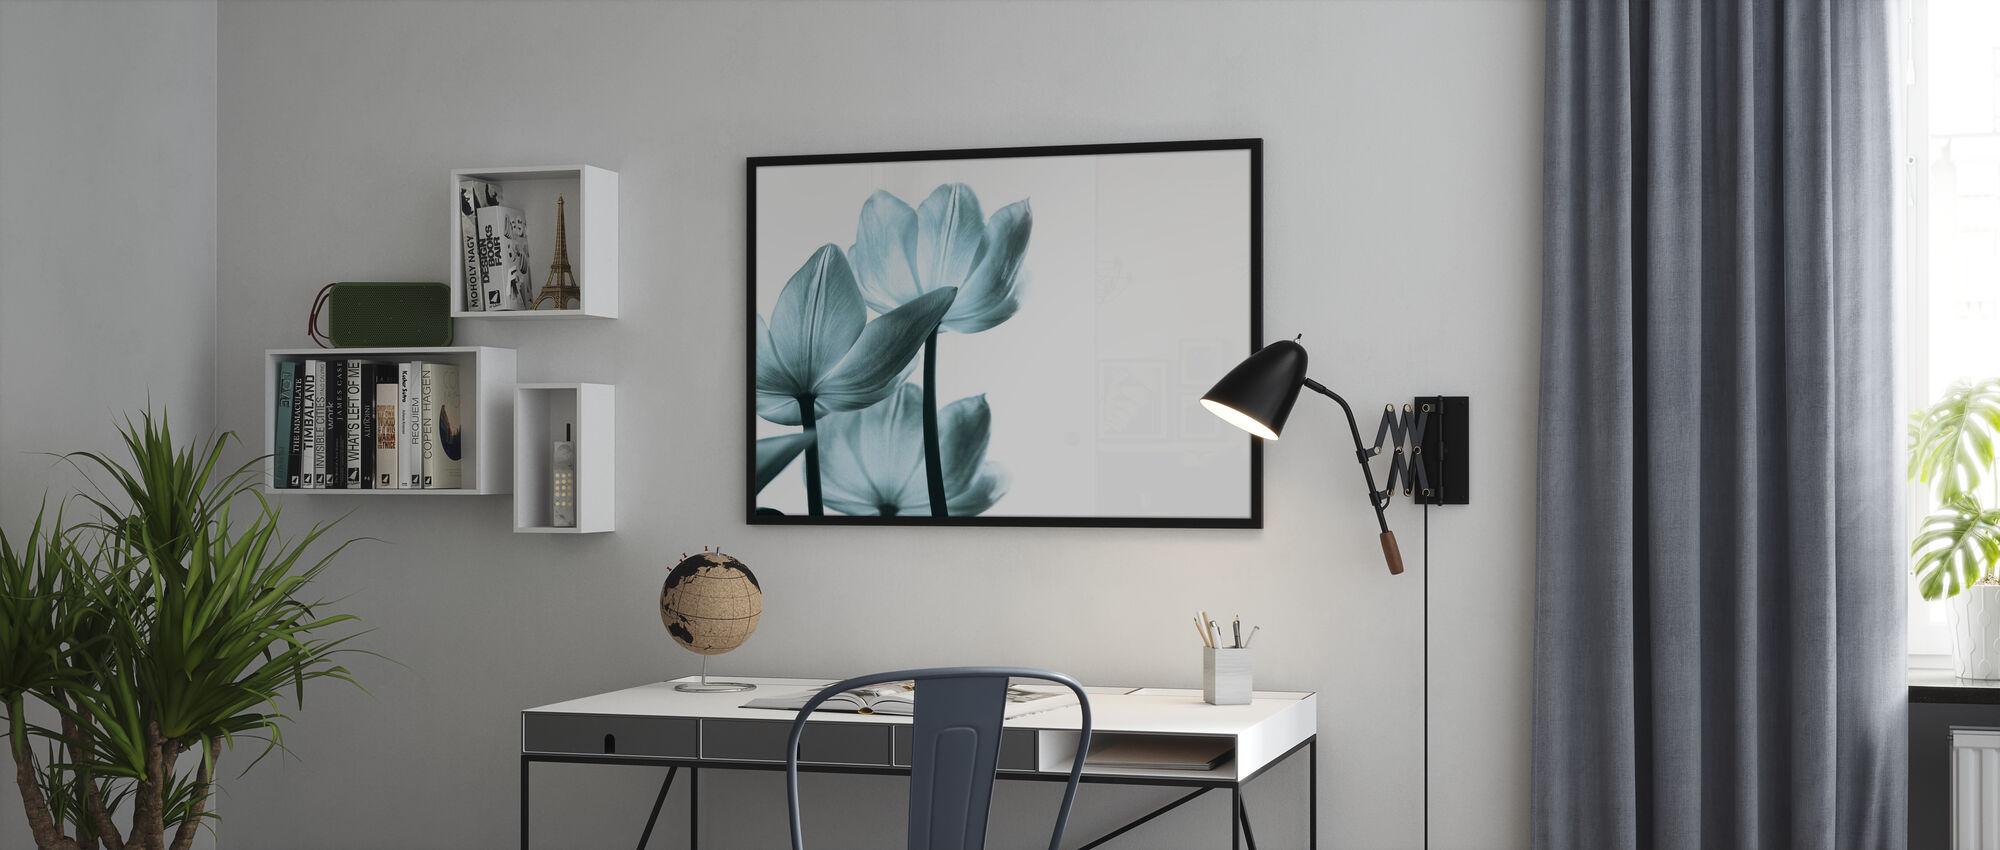 Translucent Tulips - Framed print - Office